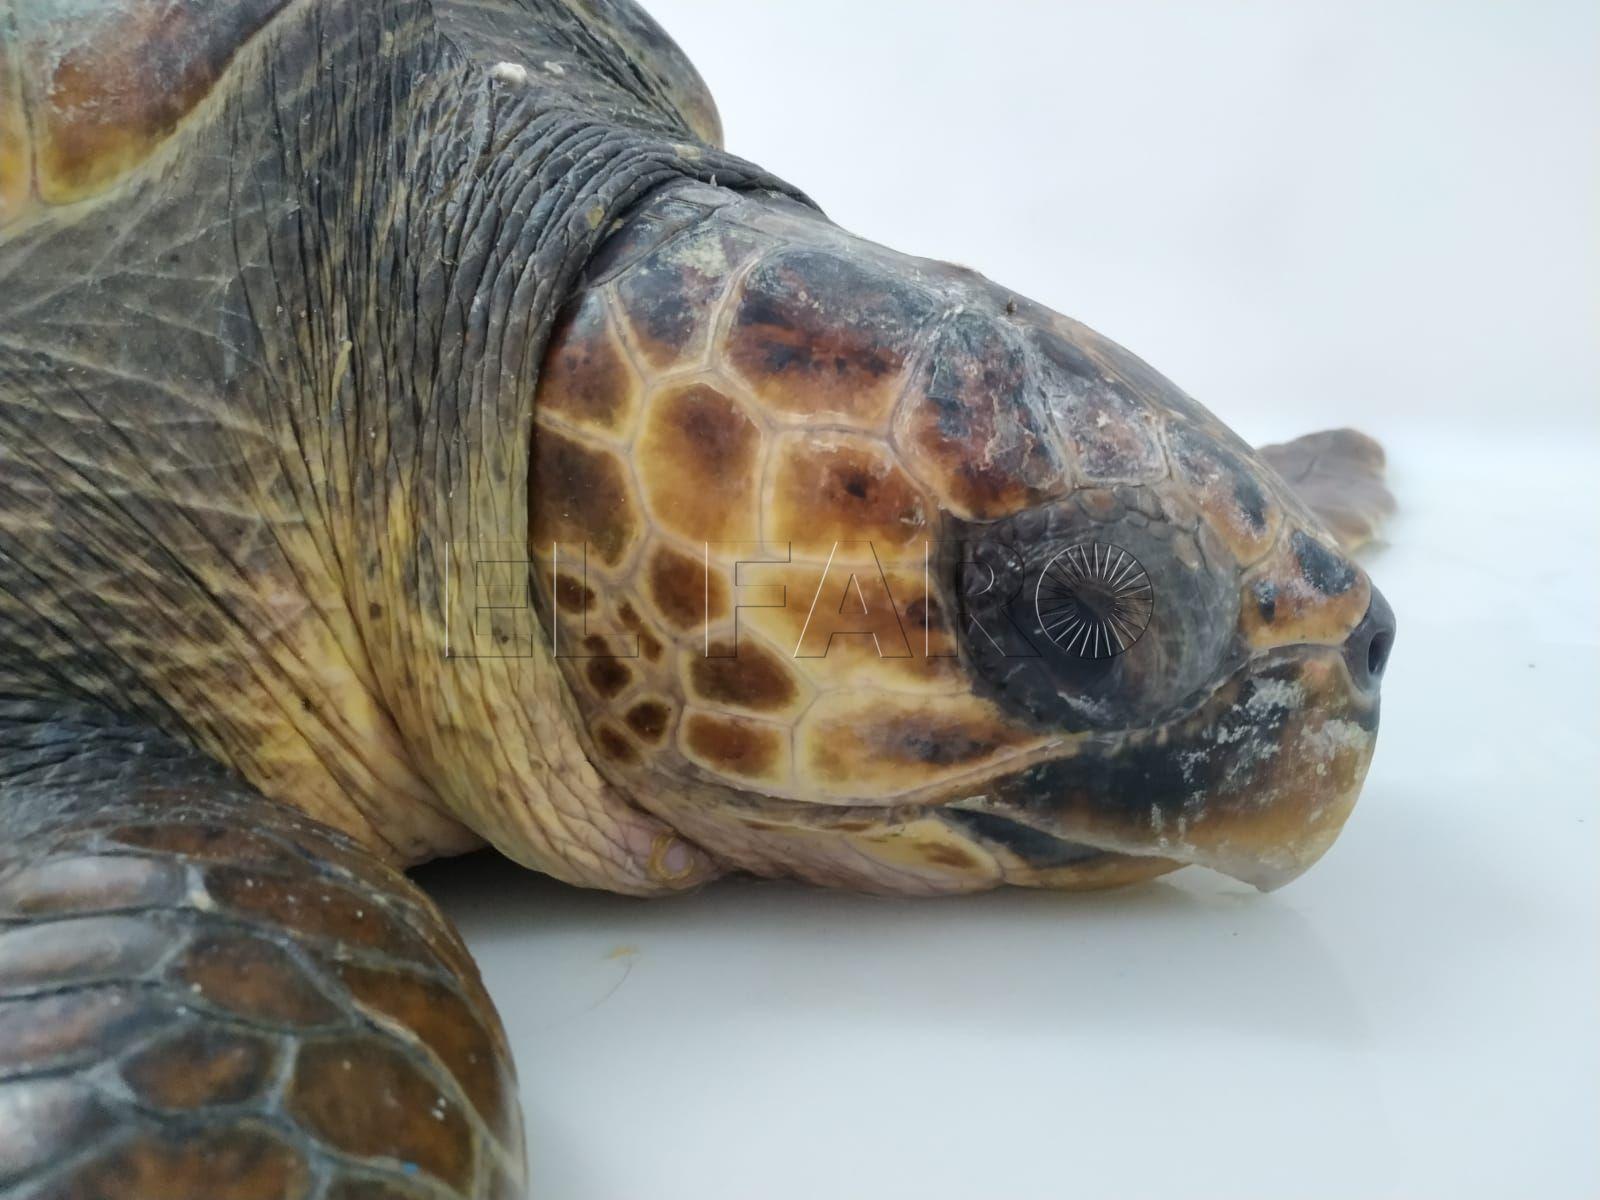 tortuga-almadraba-cecam-agosto-12-3